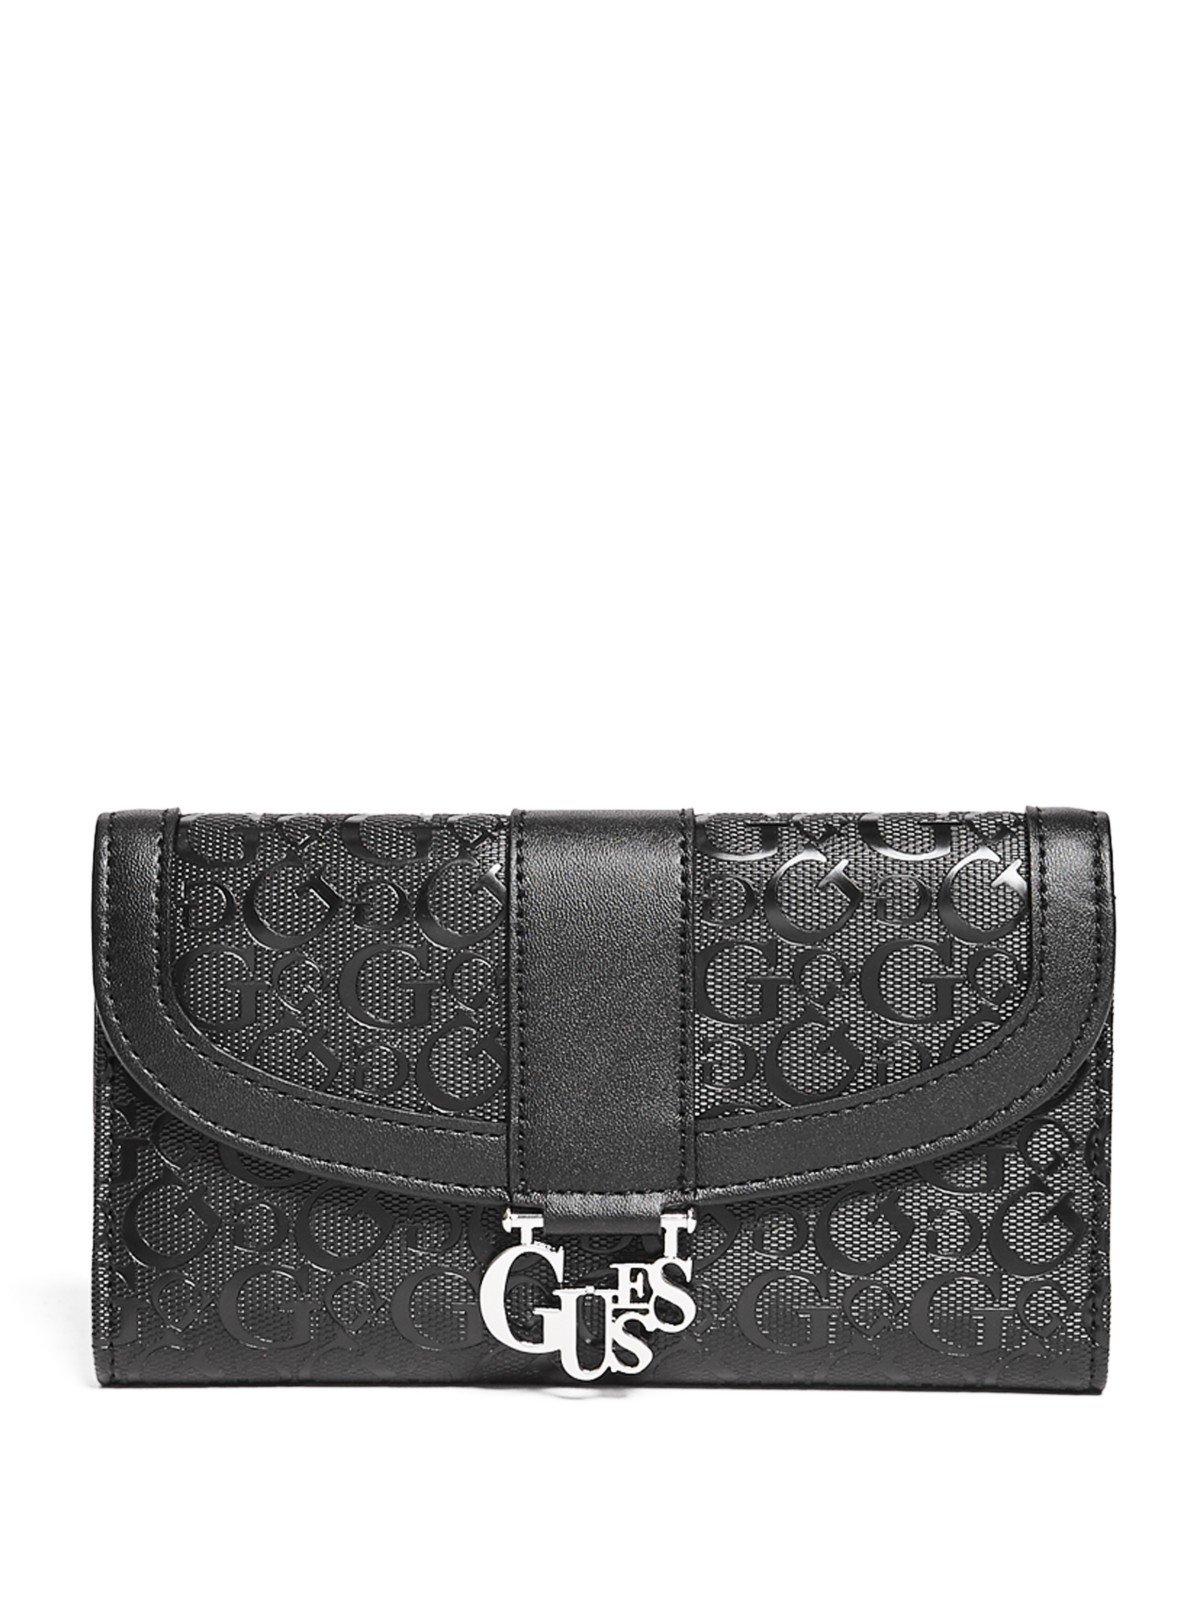 GUESS Factory Women's Hemlock Logo Slim Wallet